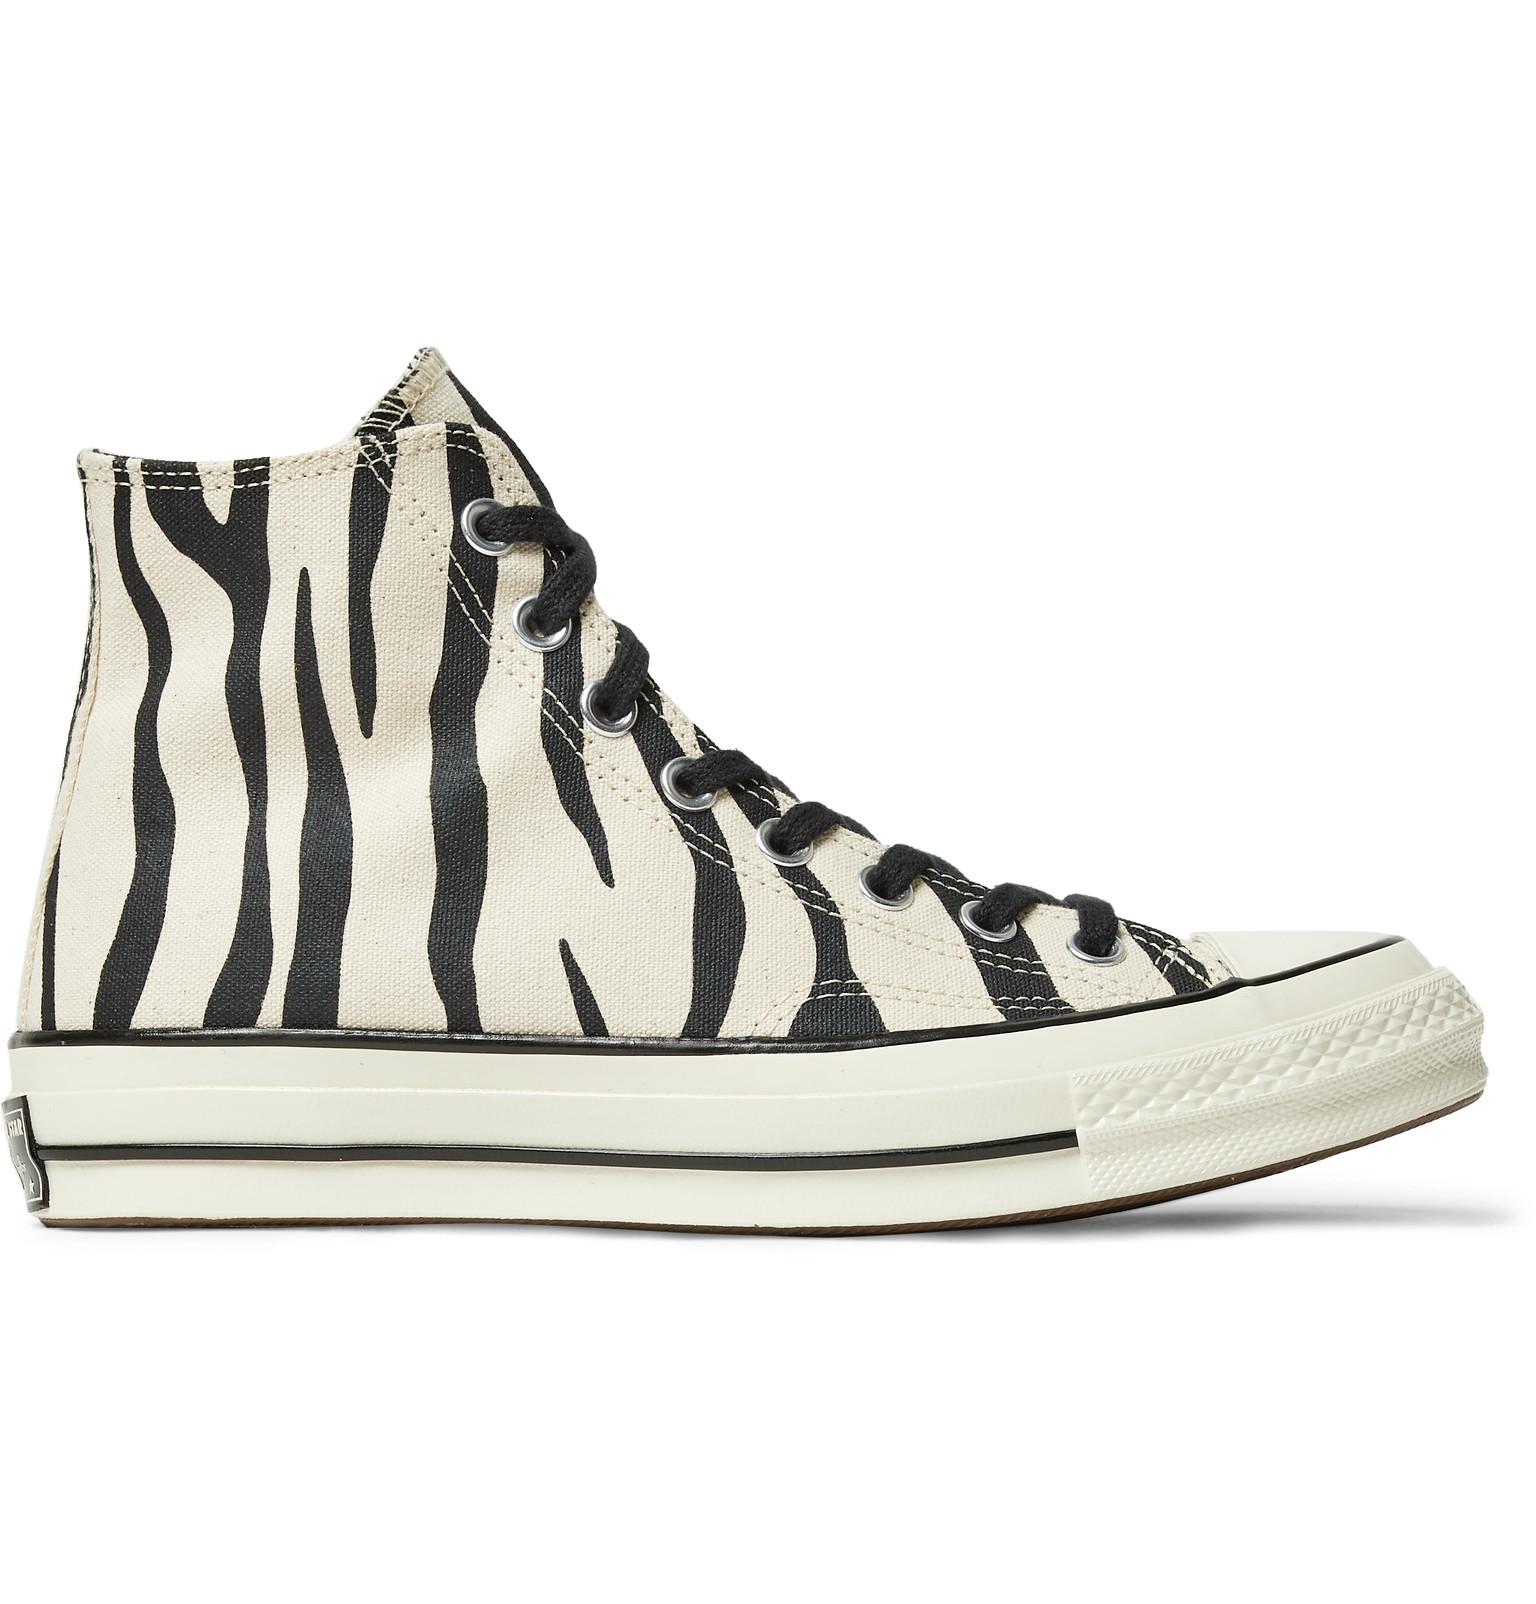 5f51e75d9de5 Converse1970s Chuck Taylor All Star Zebra-Print Canvas High-Top Sneakers.   85. Tap to Close. 1